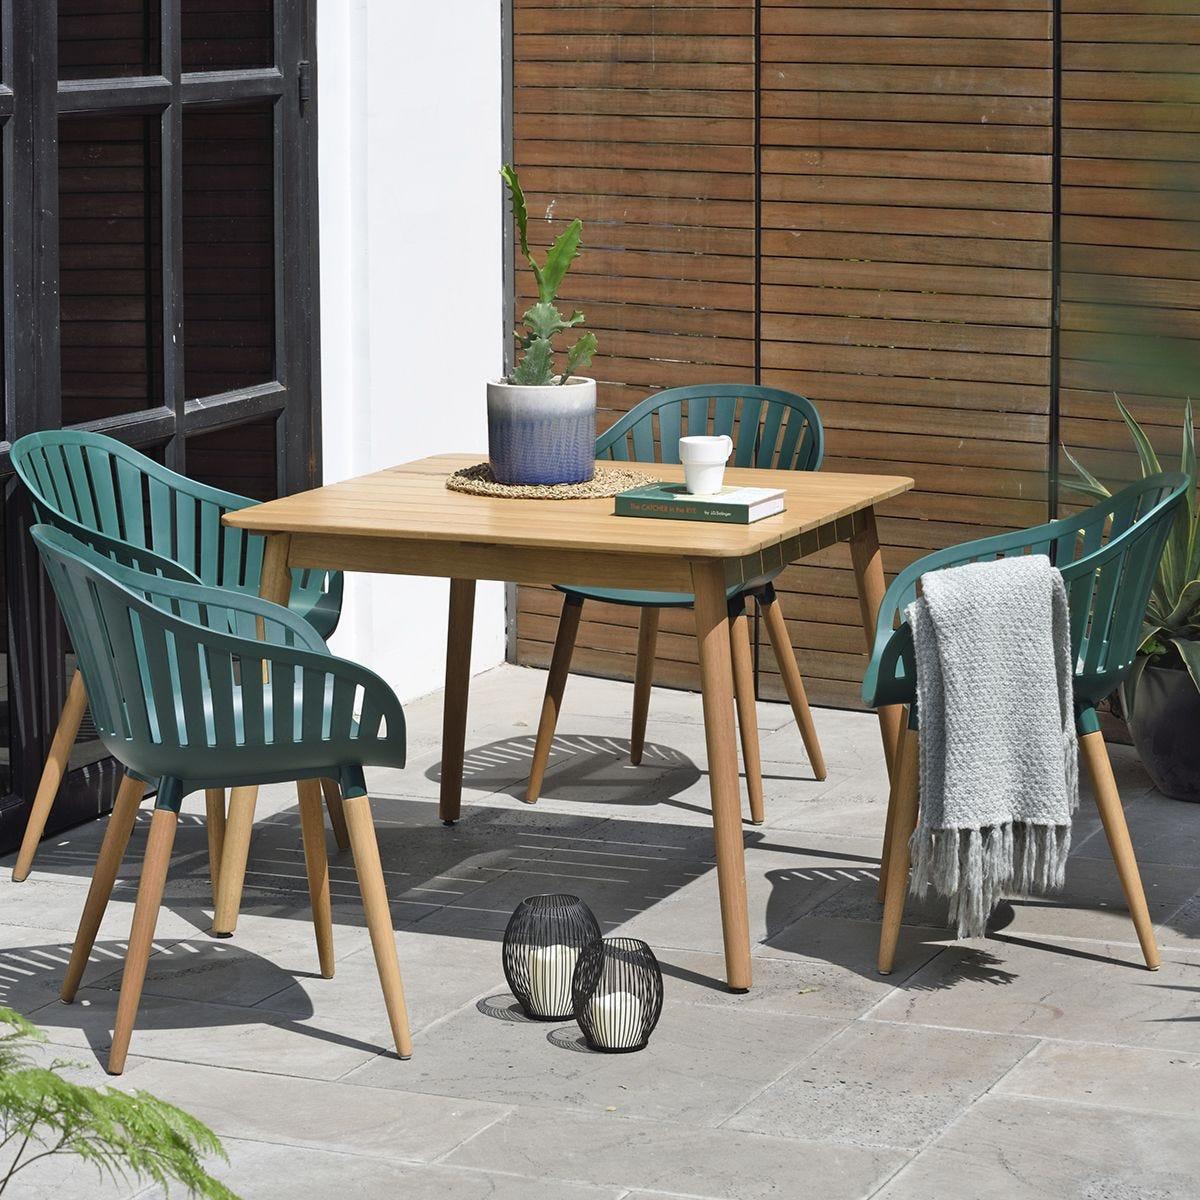 DuraOcean 4 Seater Chair and Table Set